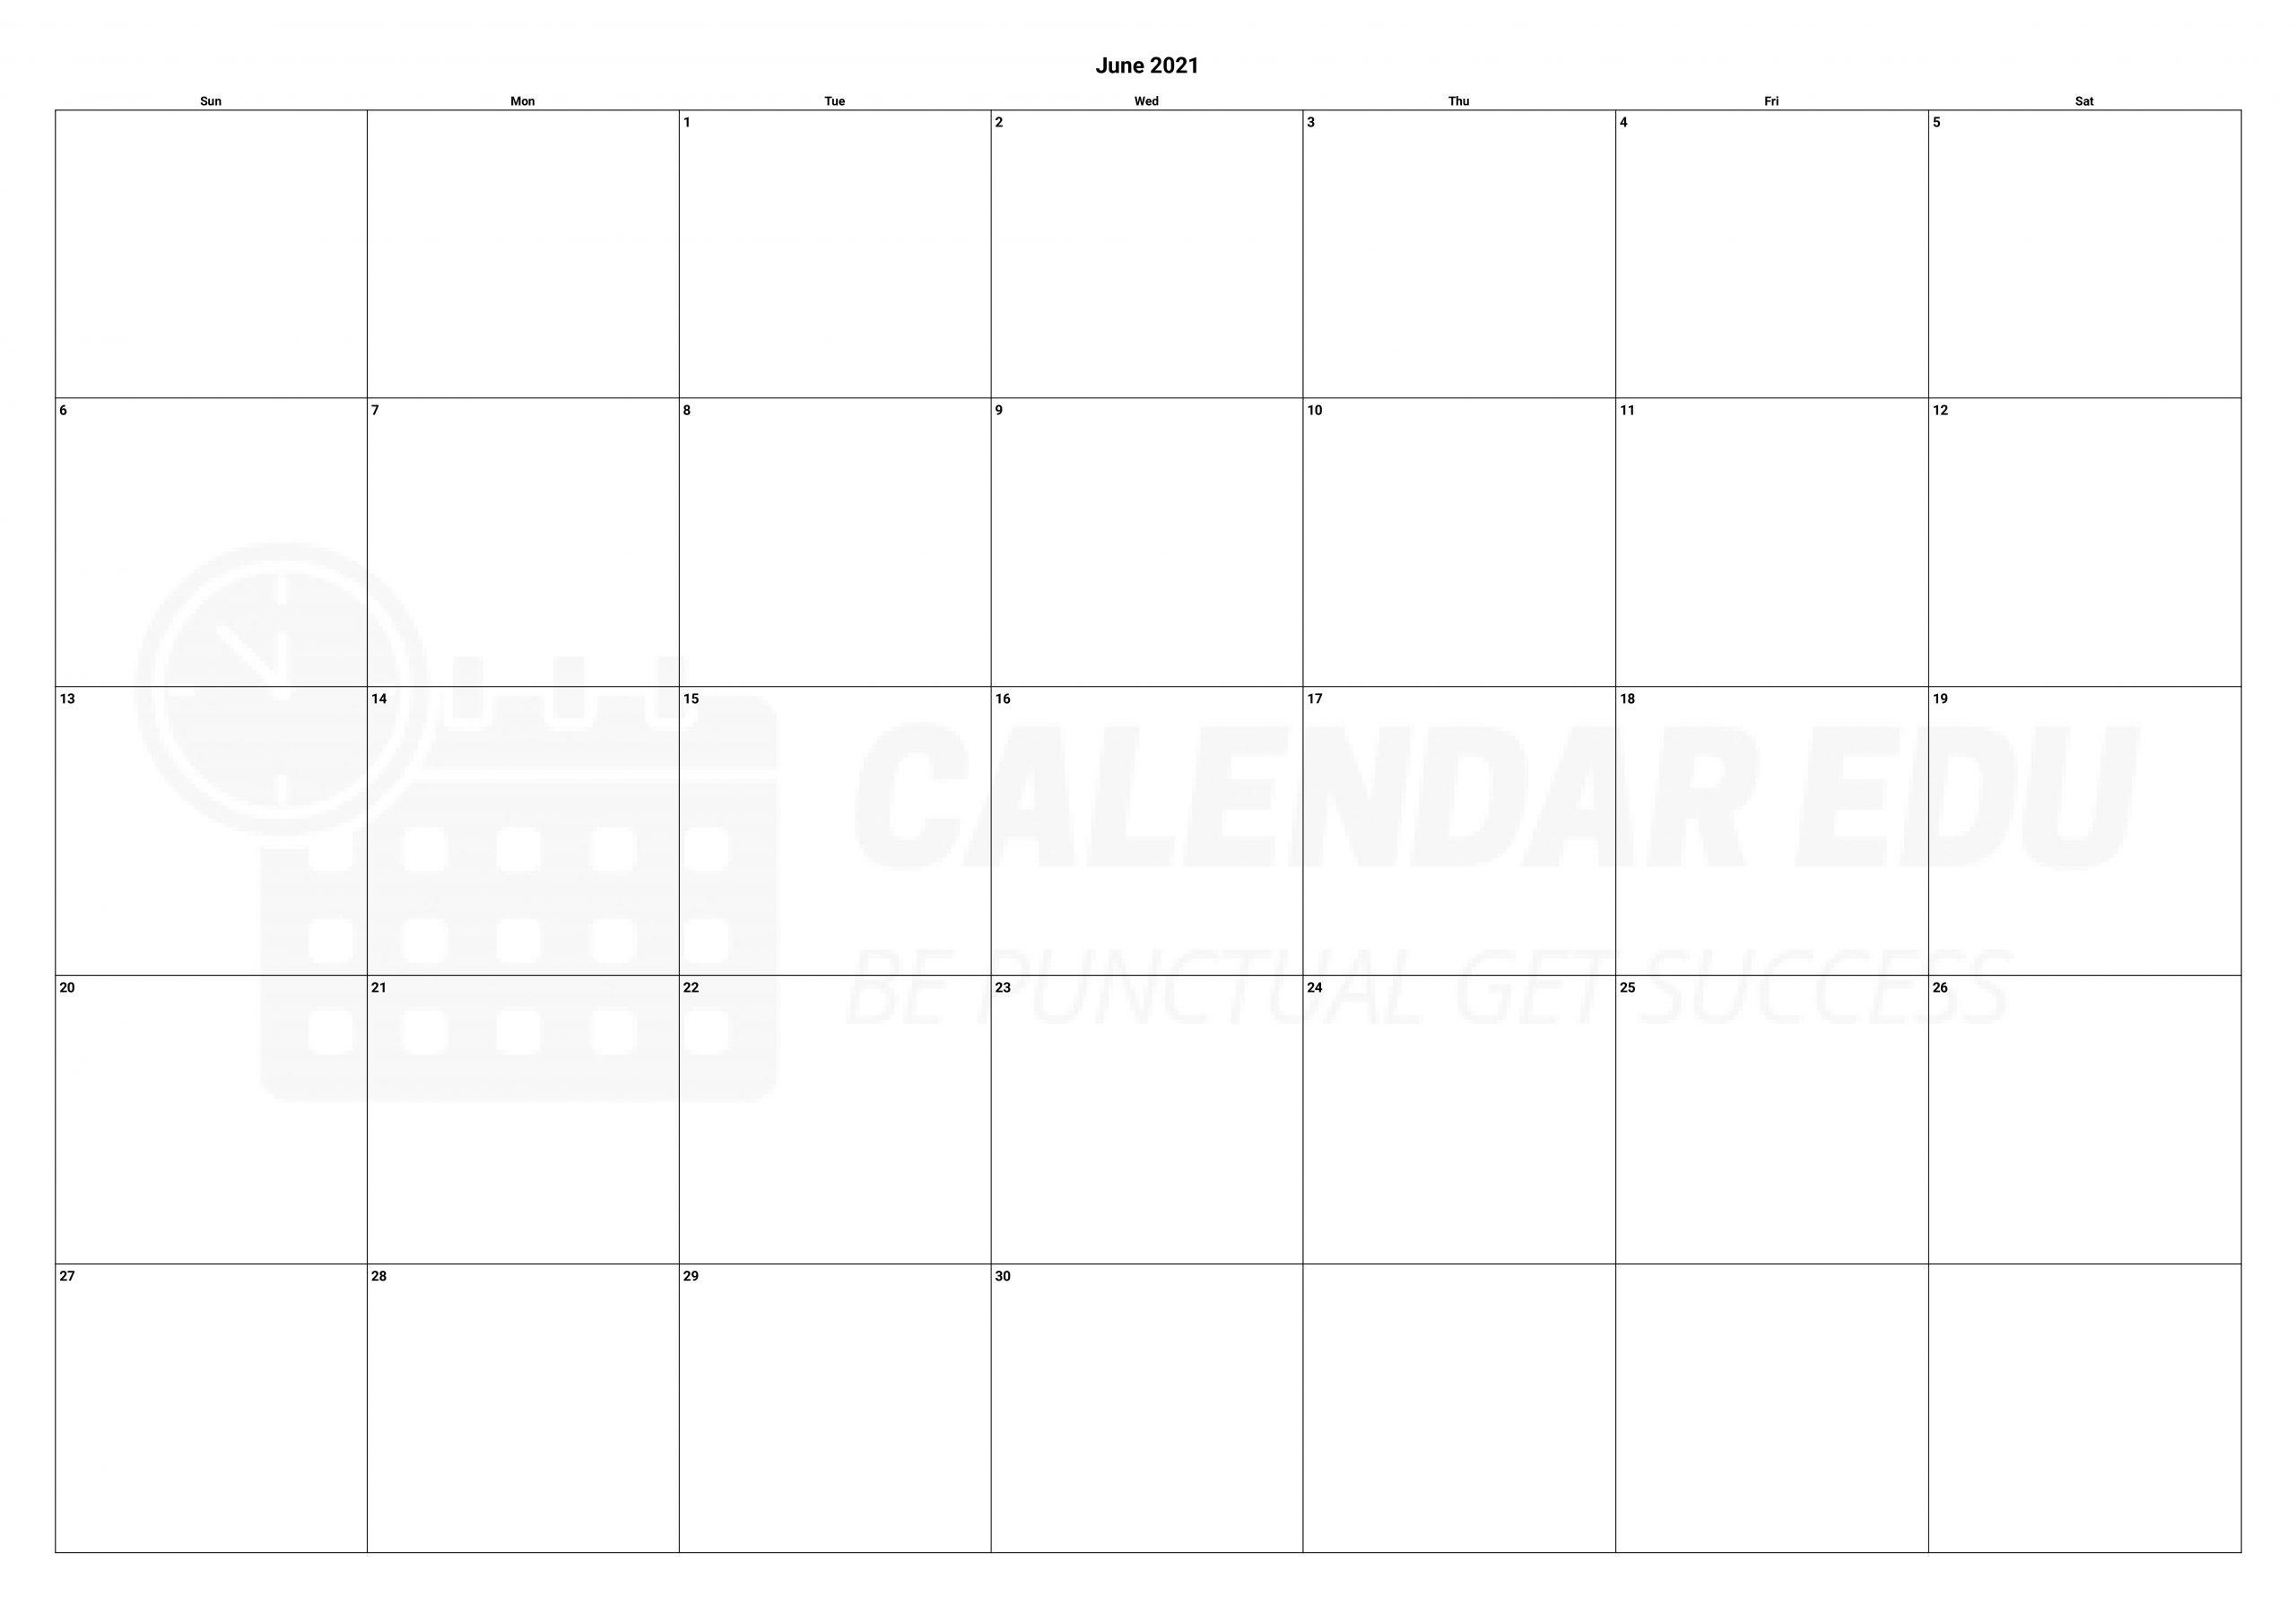 Free June 2021 Calendars | 2021 Blank Printable Templates June 2021 Calendar Blank